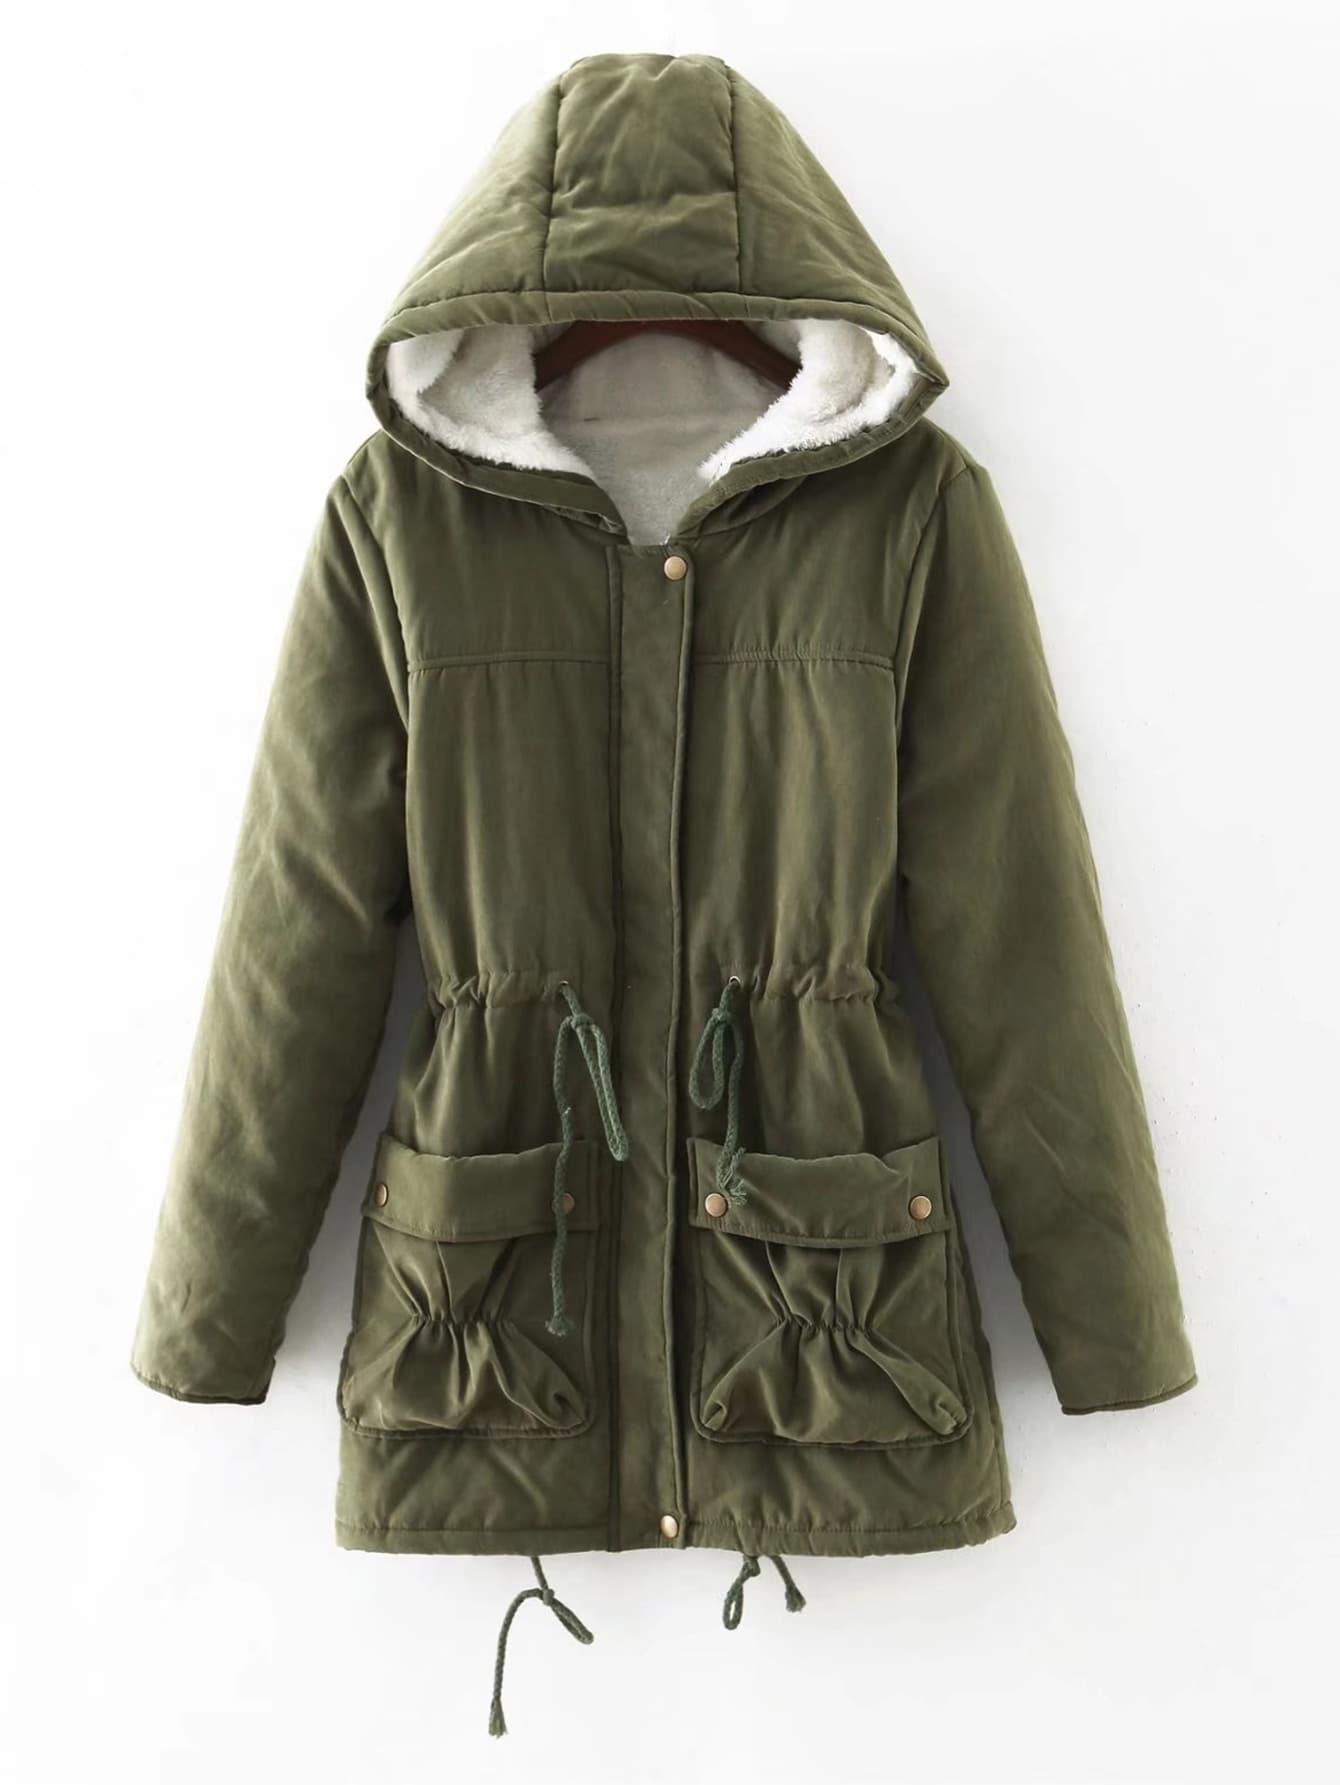 Fuzzy Lined Utility Parka Coat faux fur lined parka coat